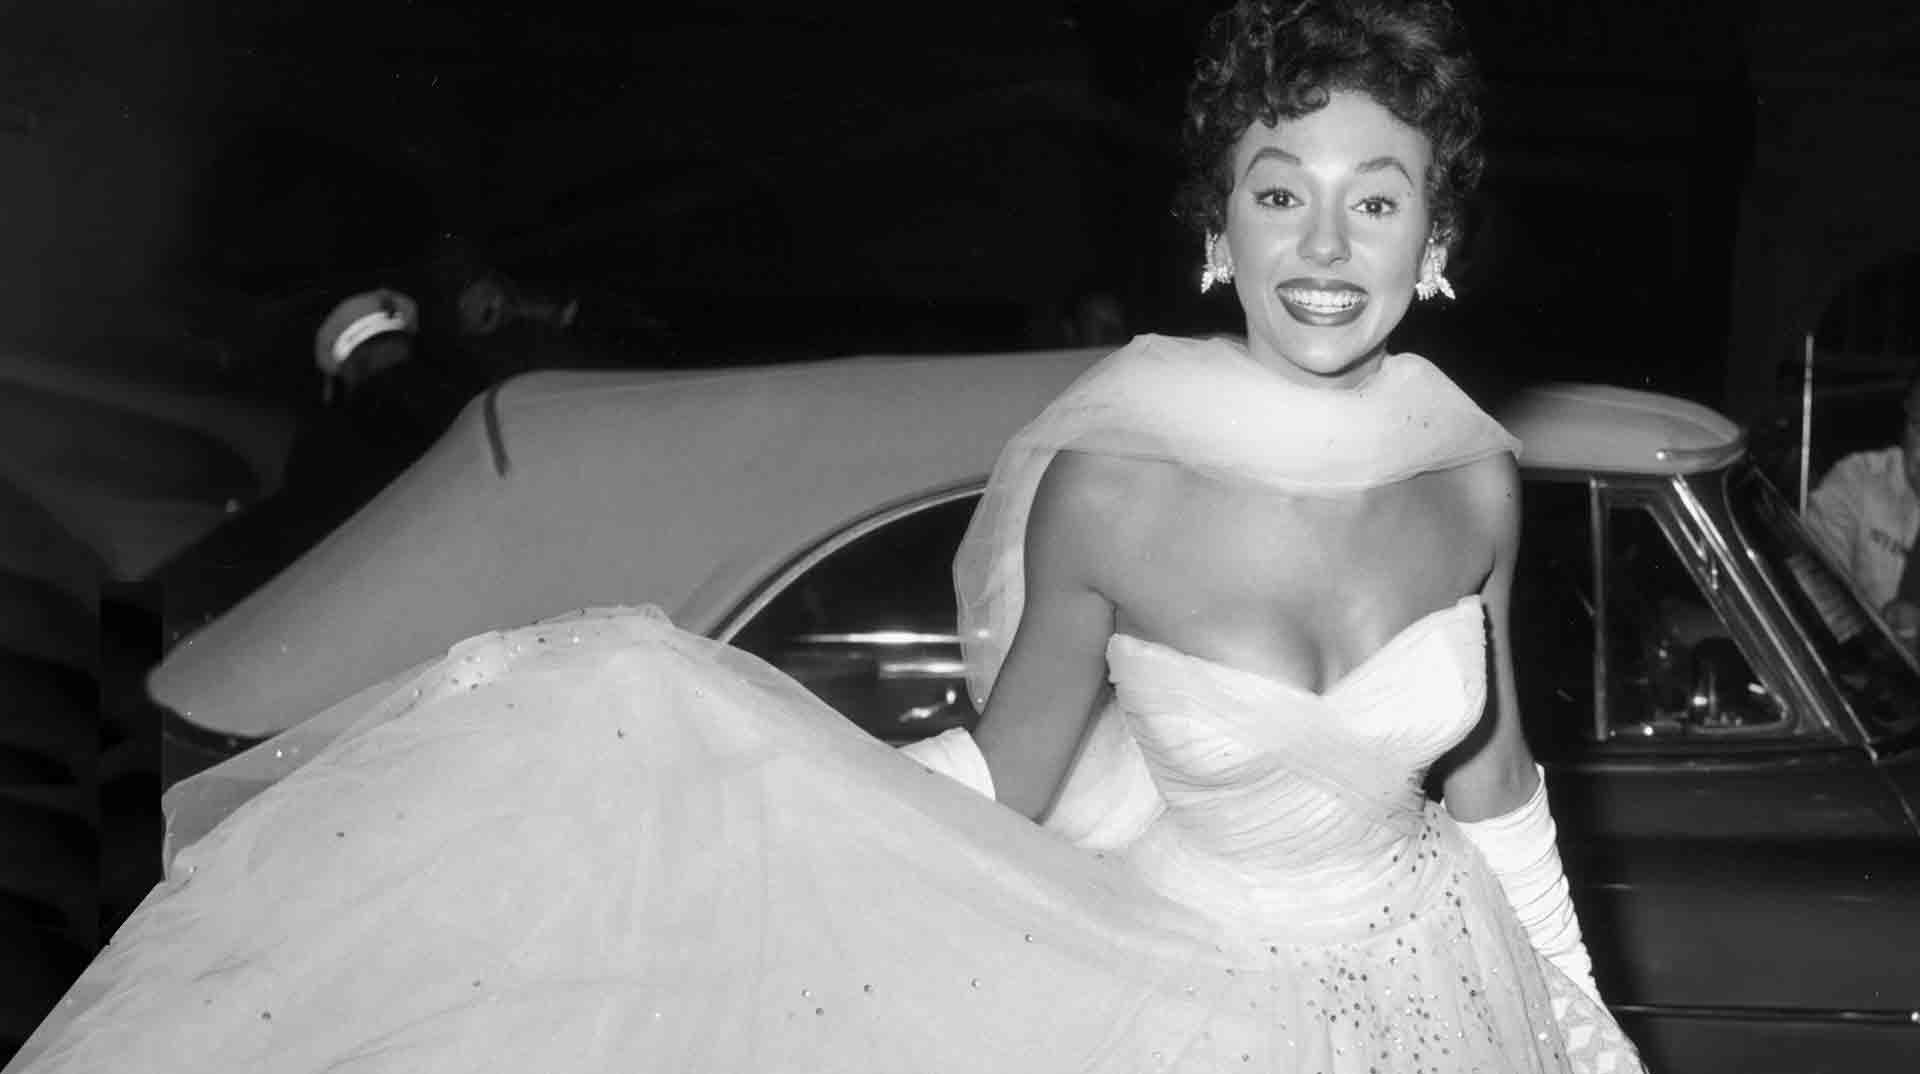 Rita Cocktail Dress in front of Car.